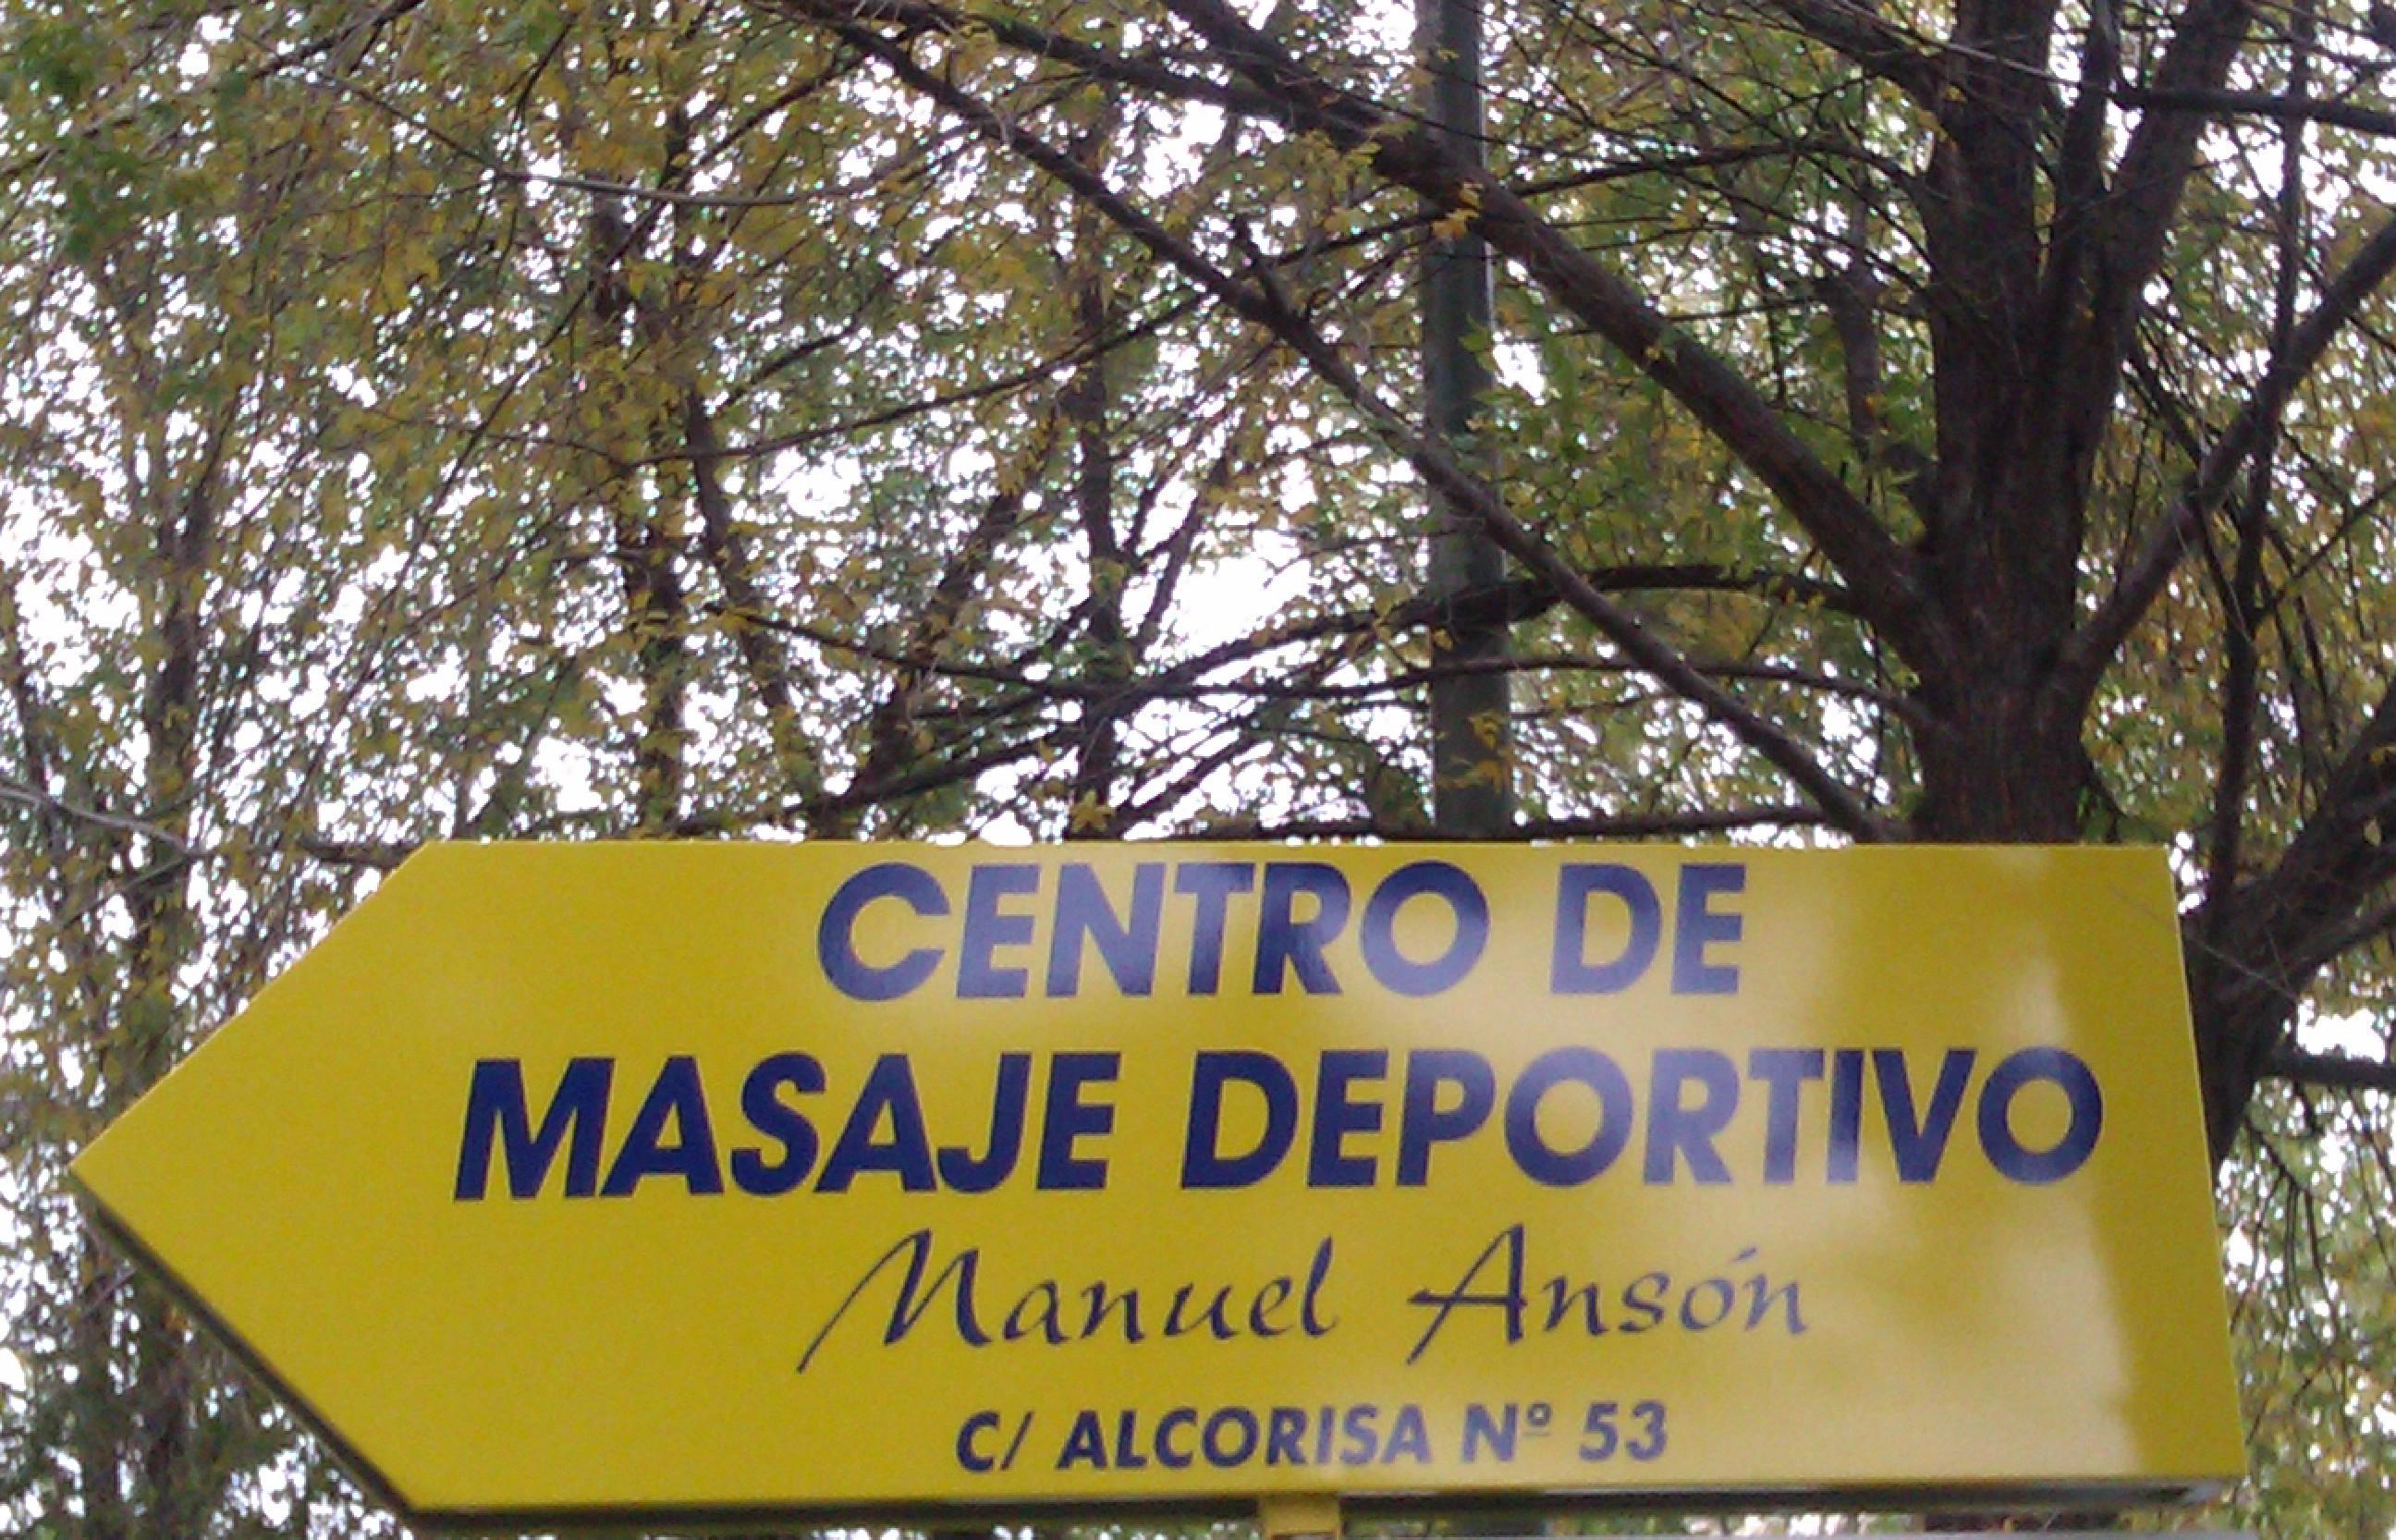 Foto 3 de Fisioterapia en Madrid | Ansón Manuel